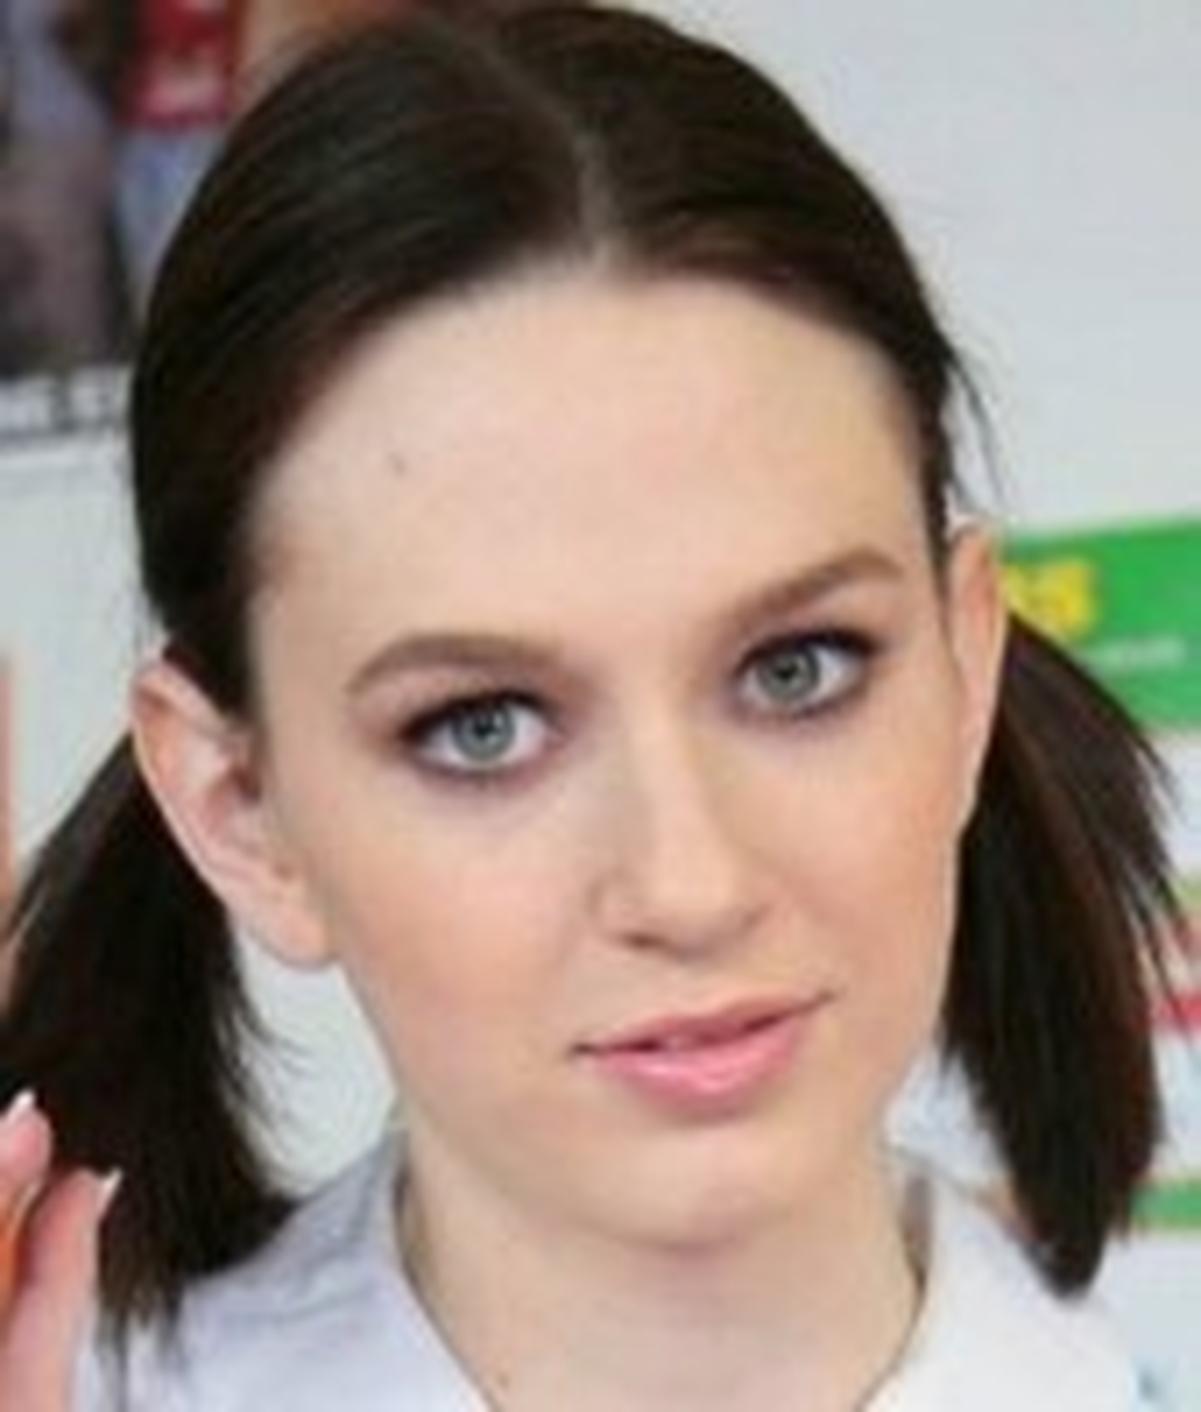 Andrea Anderson Porn andrea anderson wiki & bio - pornographic actress